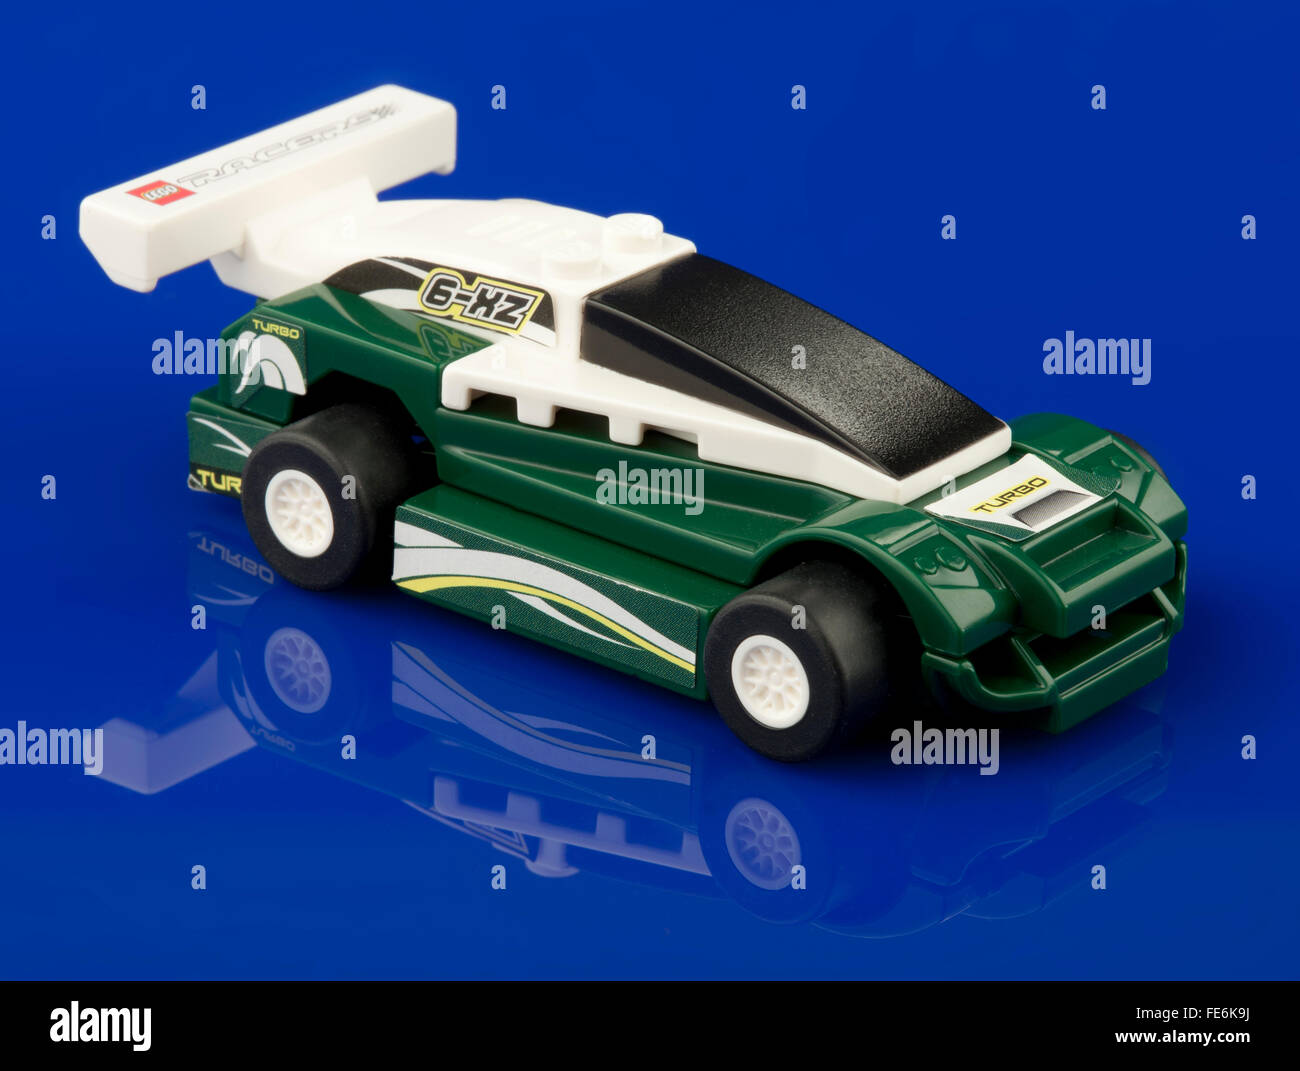 Lego racer toy car on blue background - Stock Image